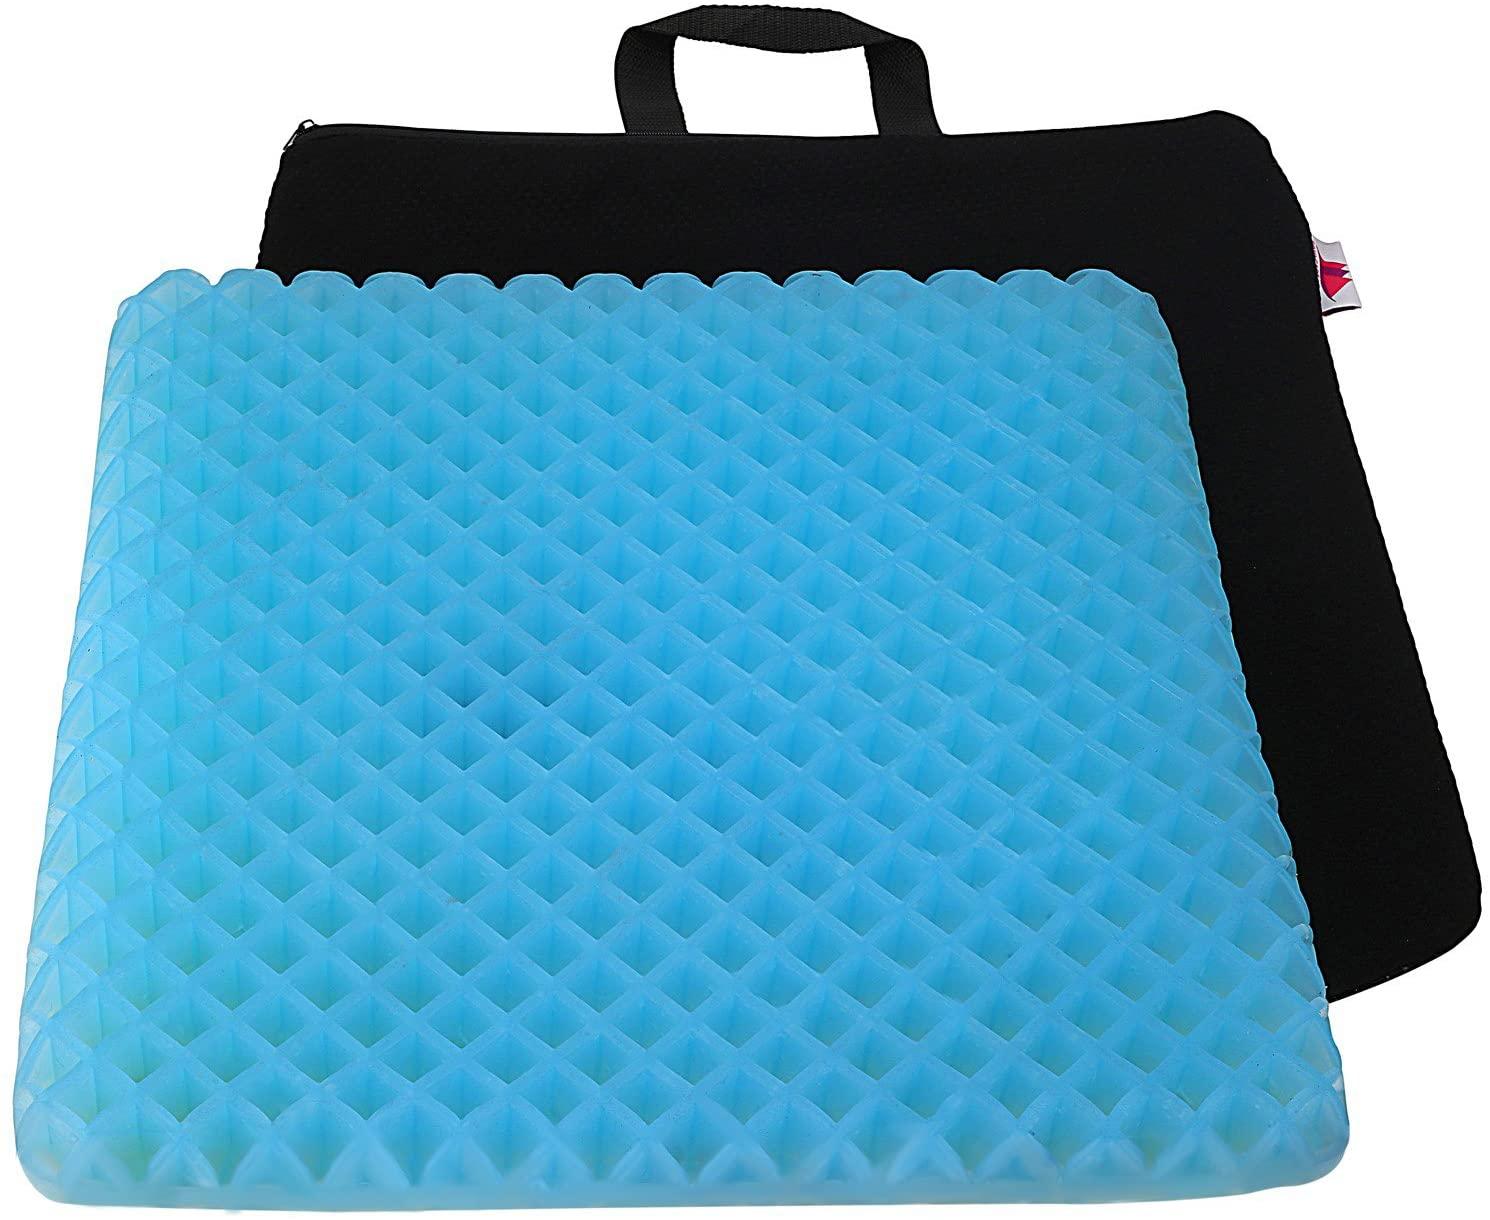 FOMI Premium Firm All Gel Orthopedic Seat Cushion Pad (15